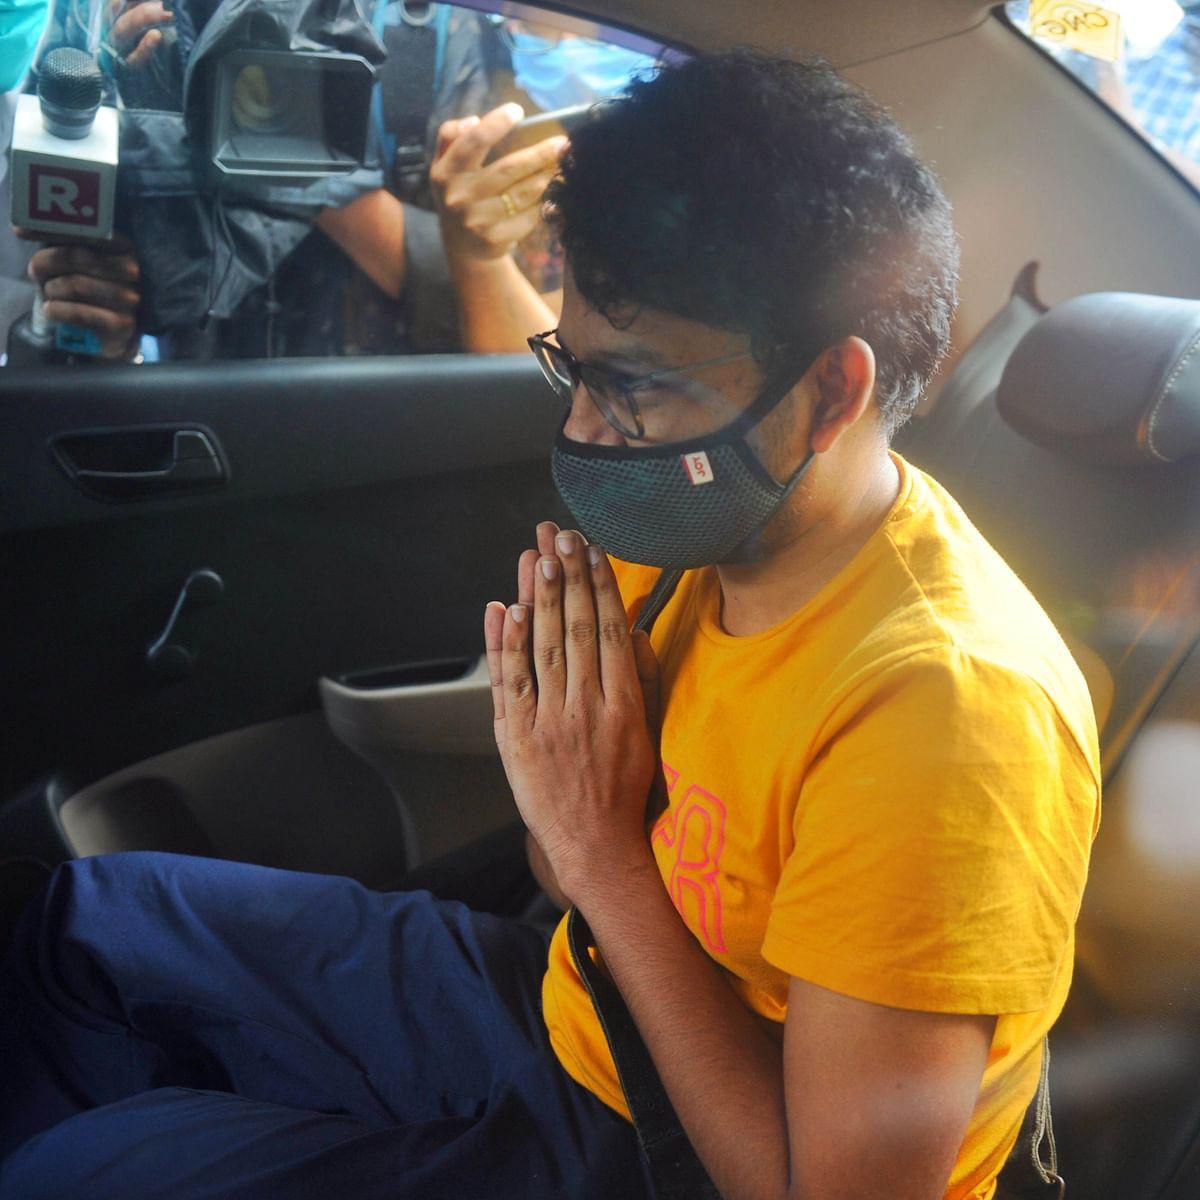 Sushant Singh Rajput's roommate Siddharth Pithani in NCB custody till June 1